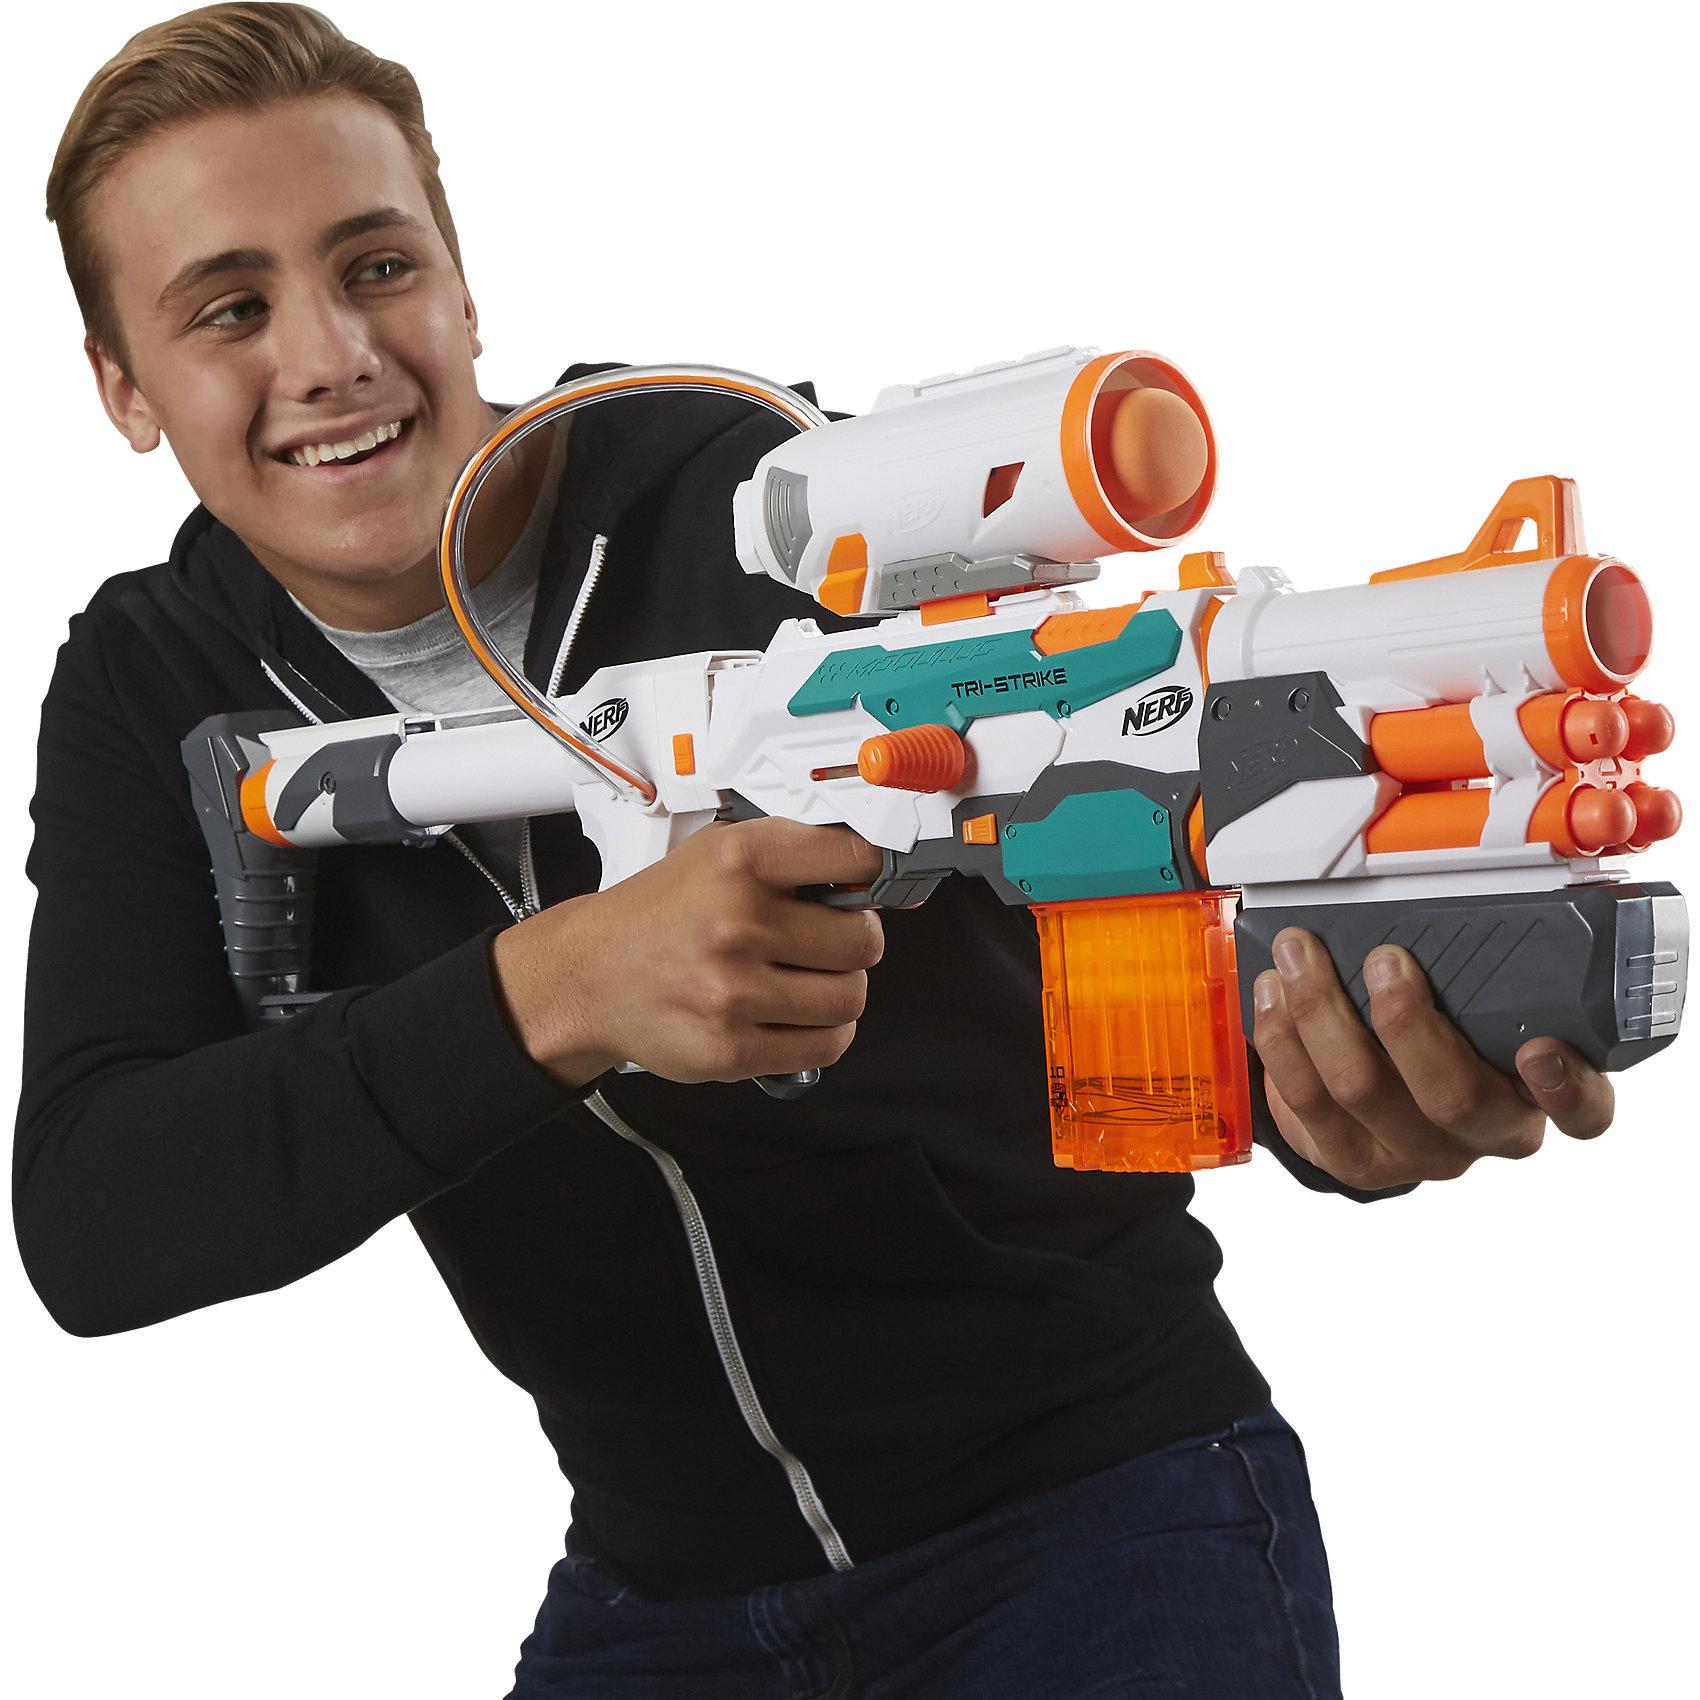 Hasbro Бластер Модулус Три-Страйк, NERF игрушечное оружие nerf hasbro элит 3 ракеты